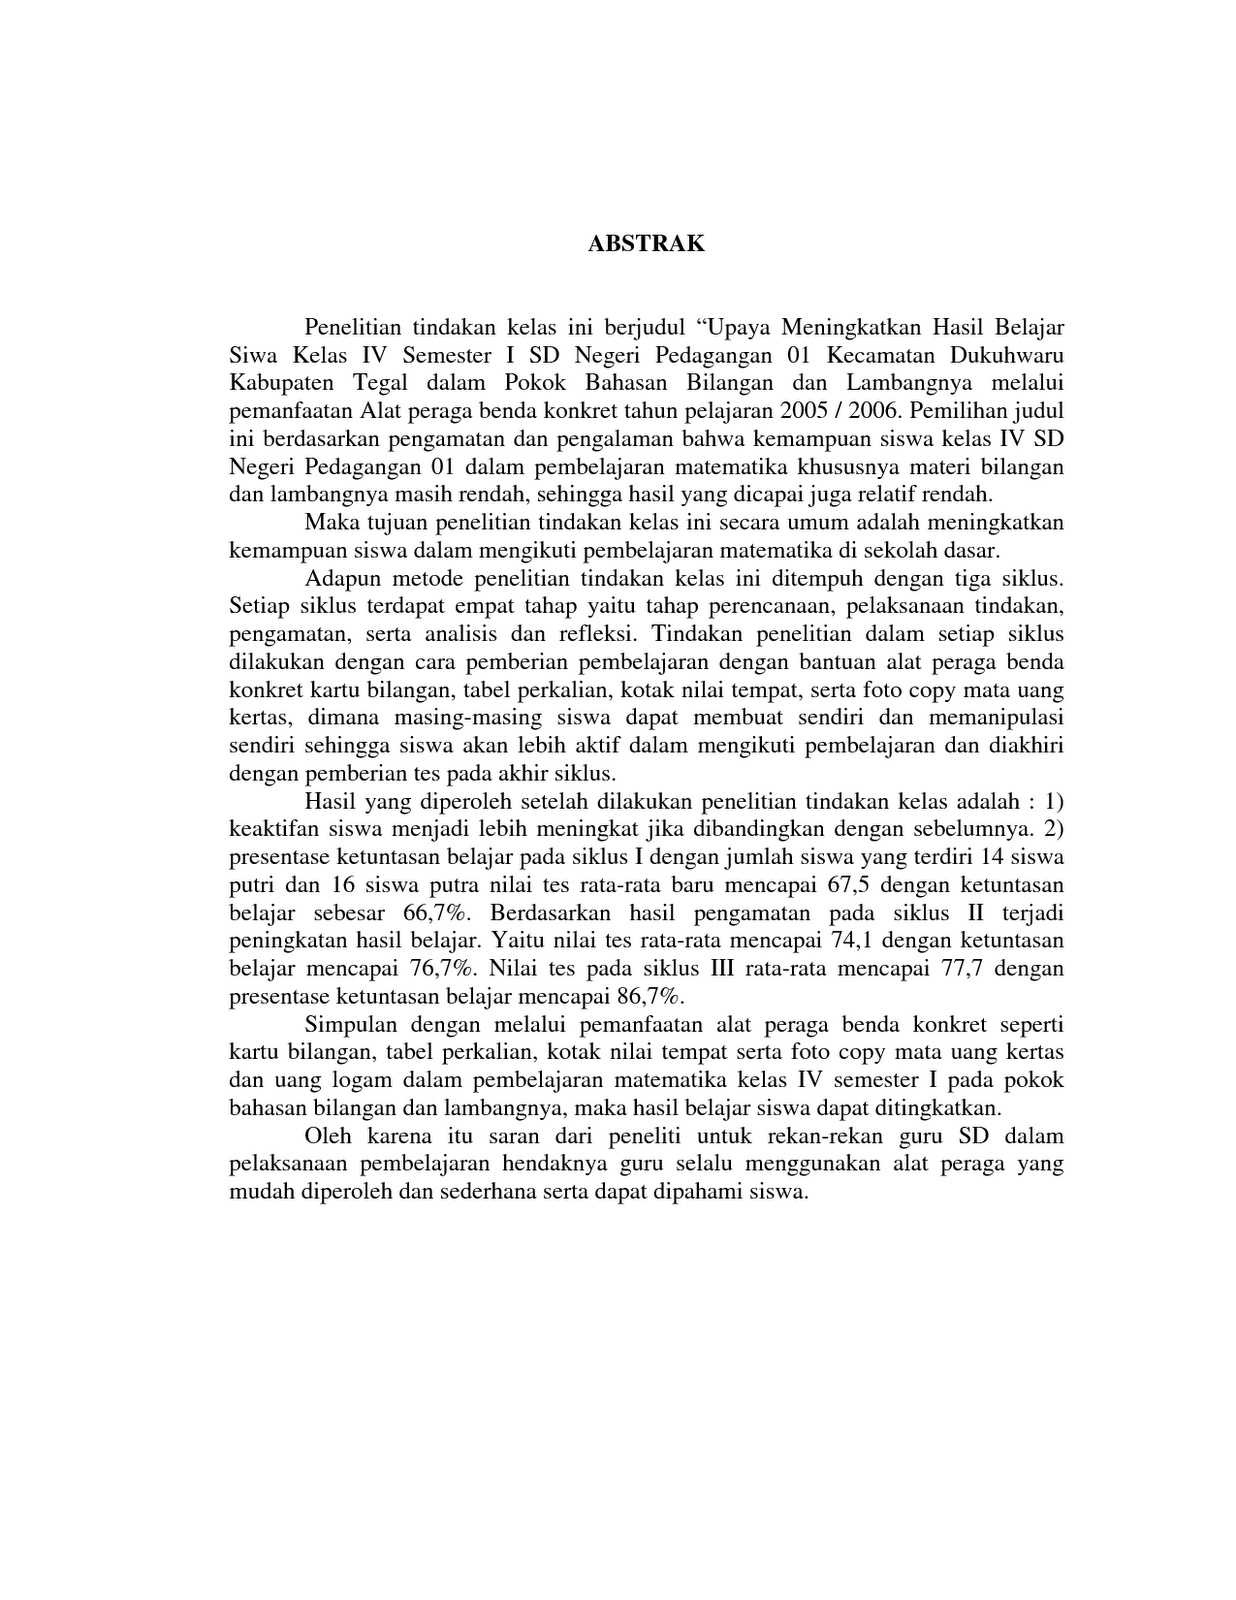 Contoh Kasus Penyelesaian Sengketa Diluar Pengadilan Semuanya Ada Di Sini Contoh Sederhana Kerangka Penelitian Ilmiah 529 X 492 Png 128kb Contoh